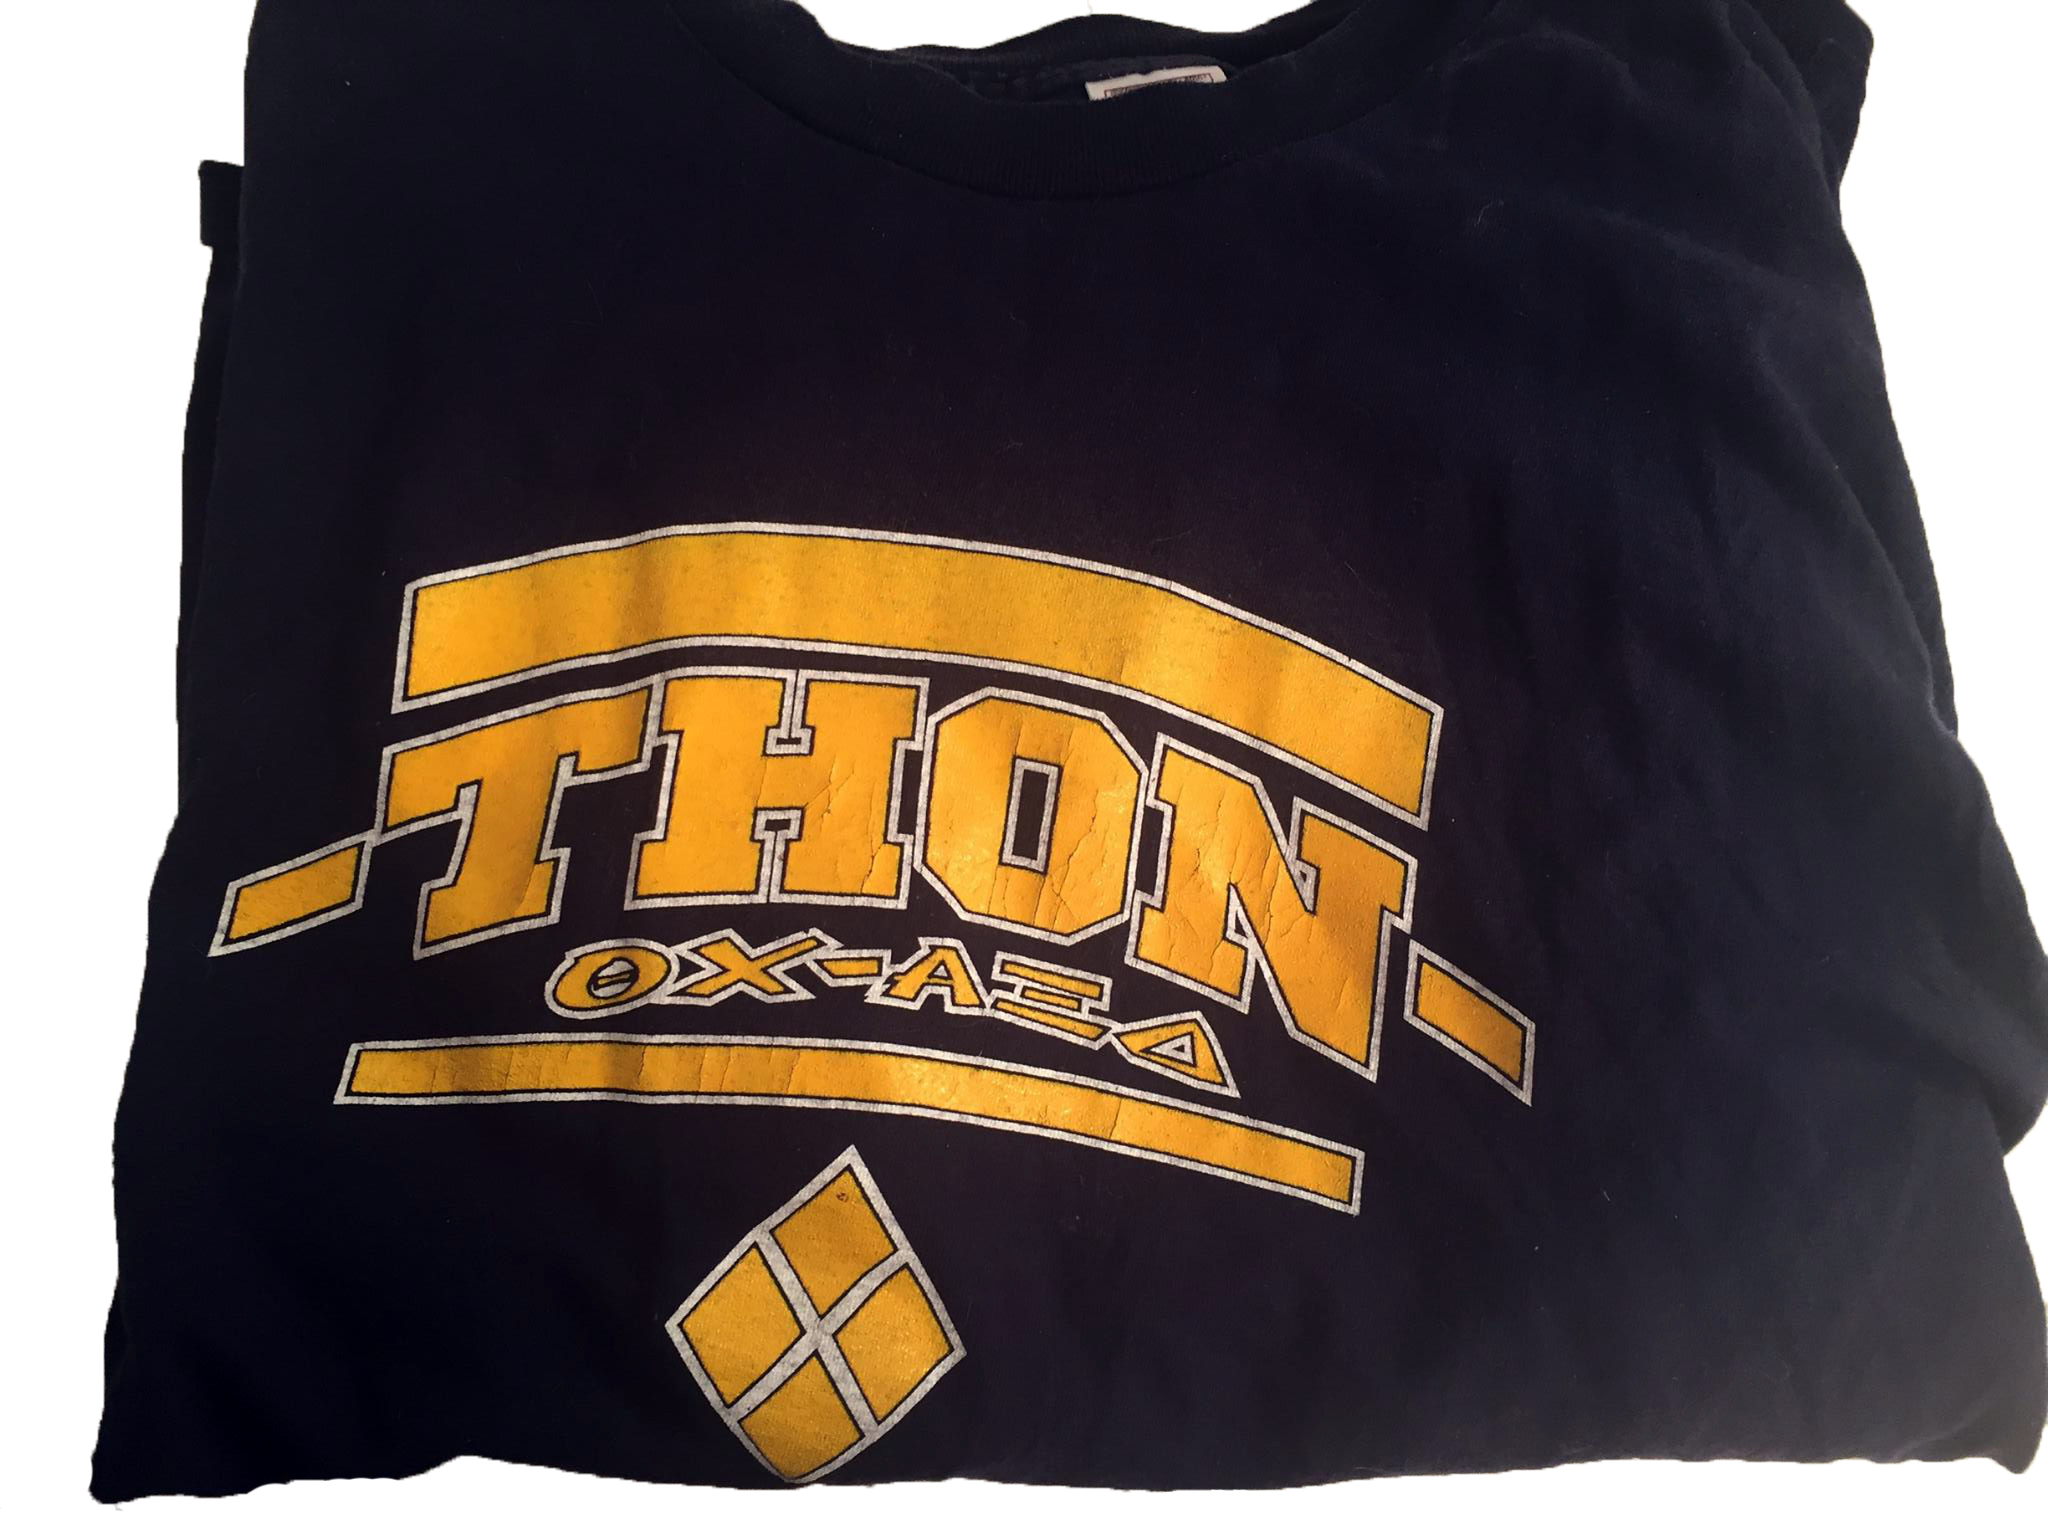 Theta Chi and Alpha Zeta Delta 2000 THON T-Shirt - Front